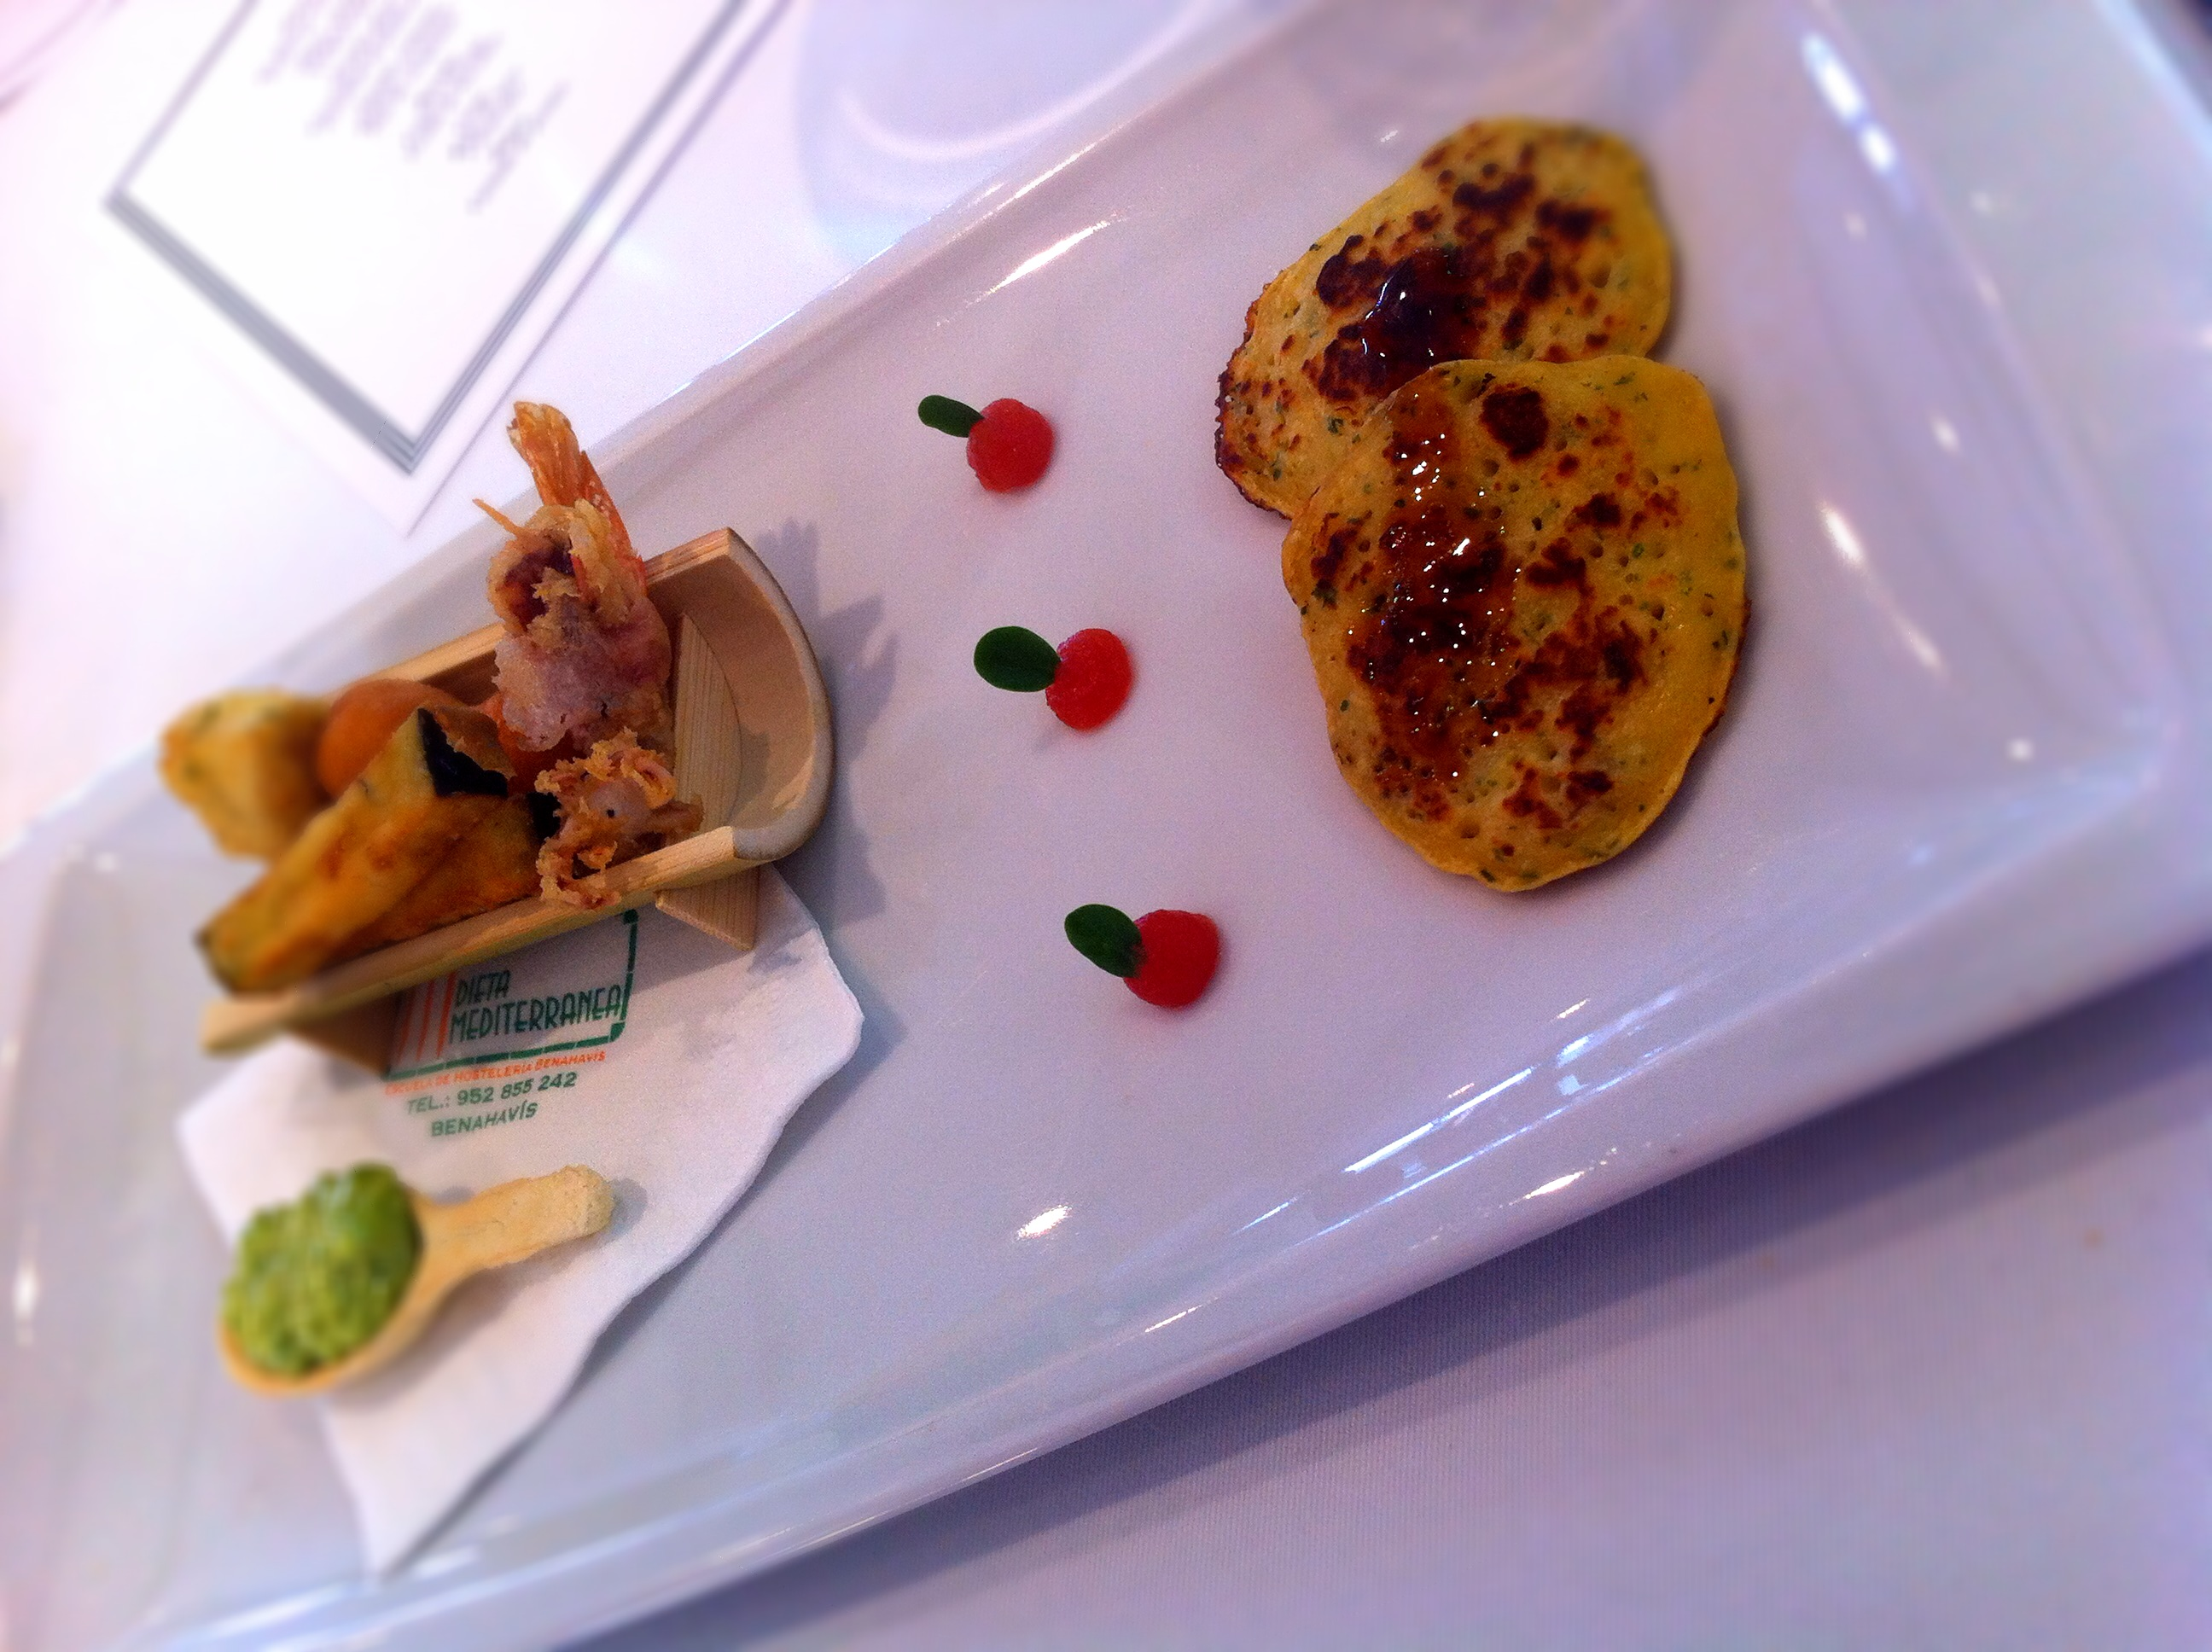 Escuela_Hosteria_Benahavis_de_la_dieta_Mediterranea_tasting_menu_andrew-forbes_fish course